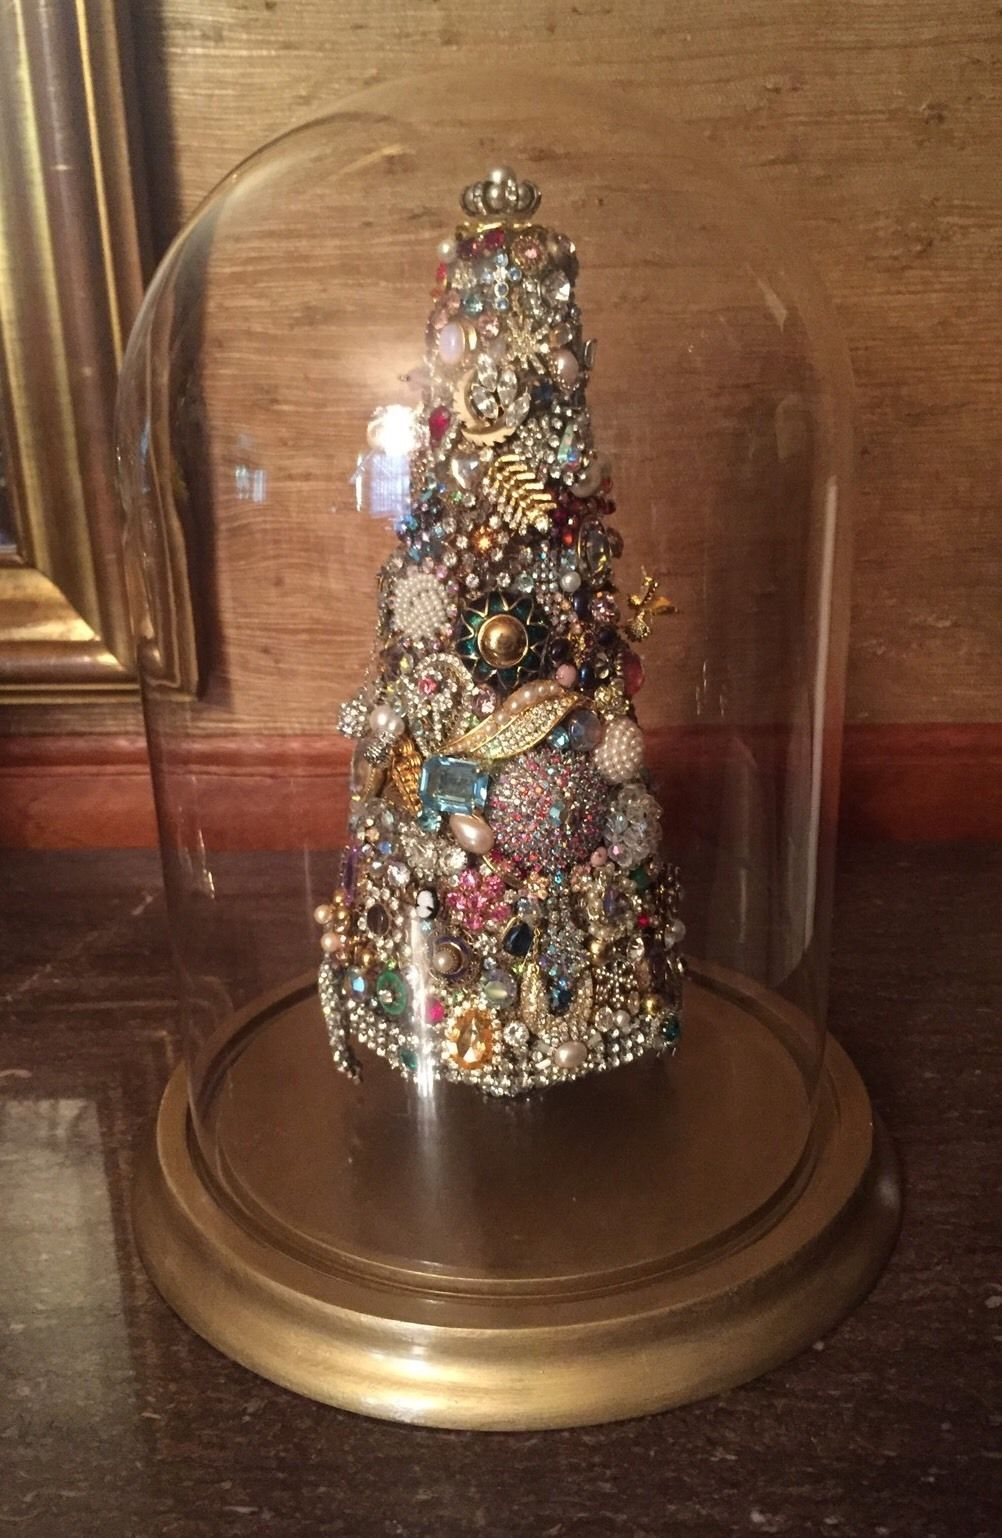 Vintage John Fontaine Rhinestone Jewelry Christmas Tree Under Glass Dome Jewelry Christmas Tree Vintage Jewelry Repurposed Vintage Jewelry Crafts